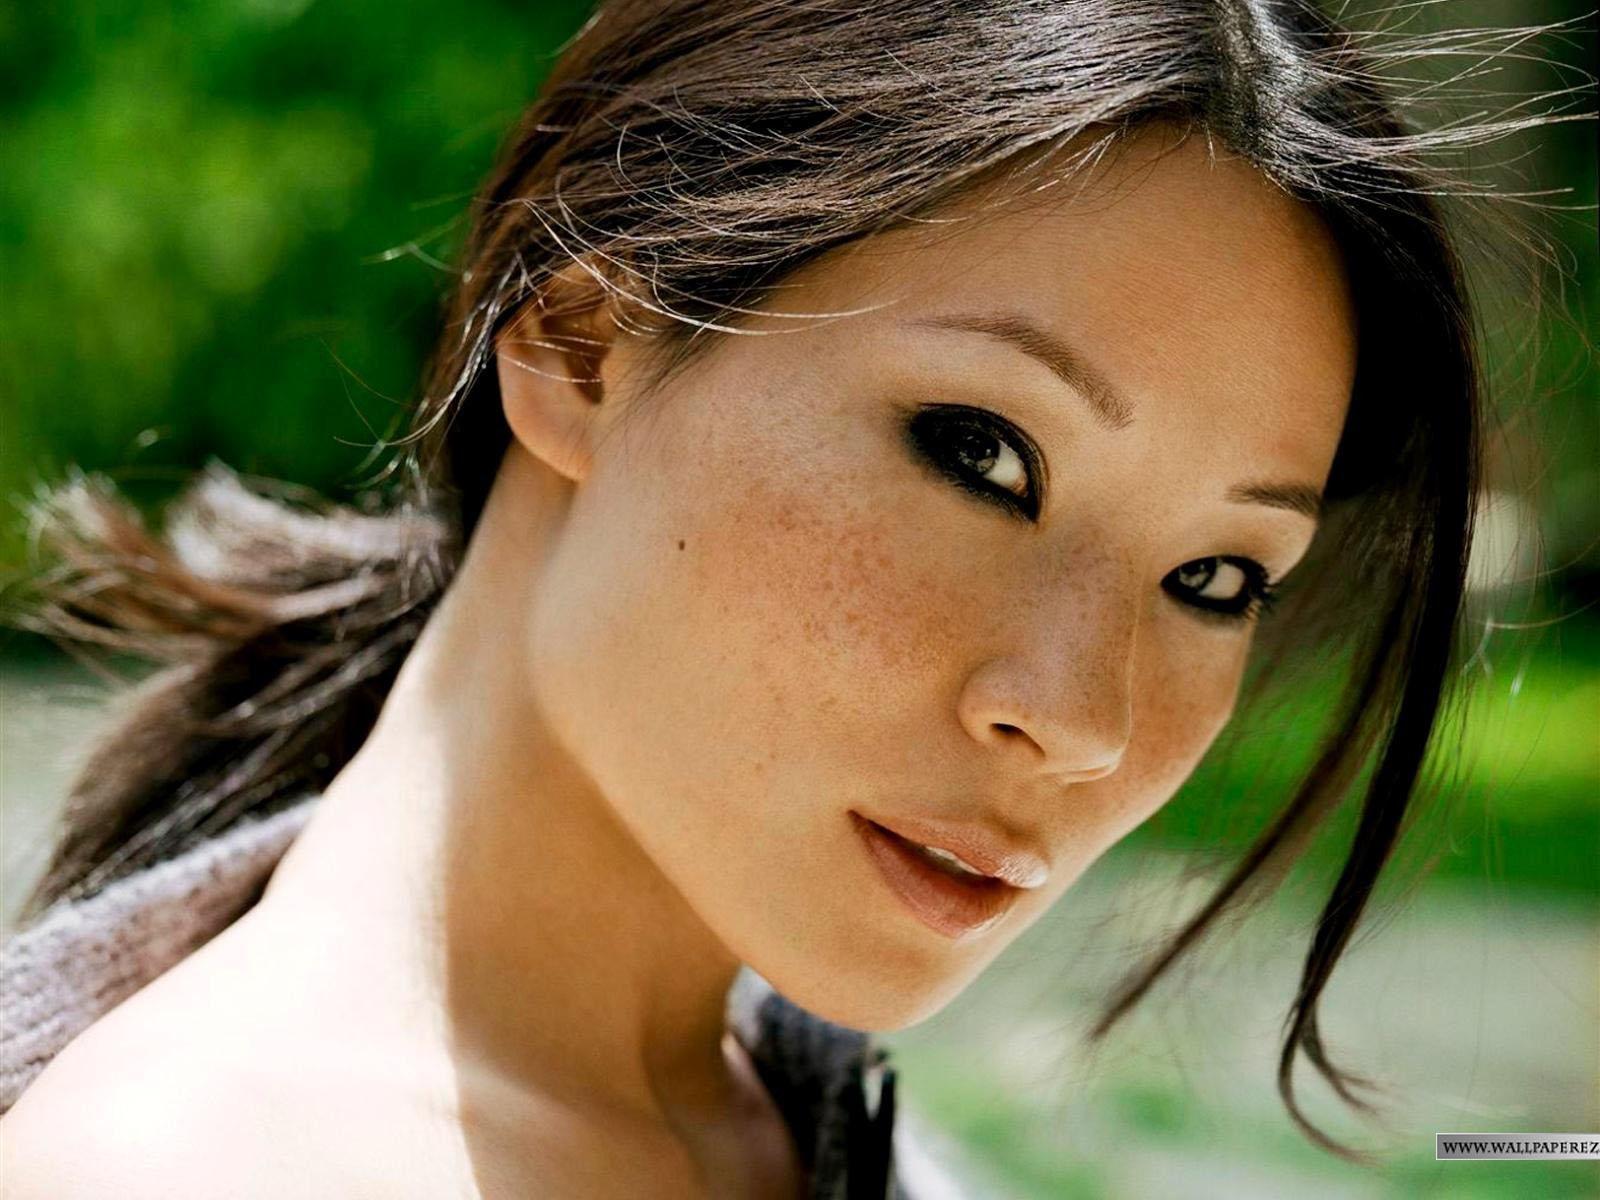 http://2.bp.blogspot.com/-50jgmDP6AIw/TyqAS0dHeEI/AAAAAAAACmE/4ePw1y_bnRo/s1600/Lucy-Liu-Photos-4d62f127cb24a.jpg